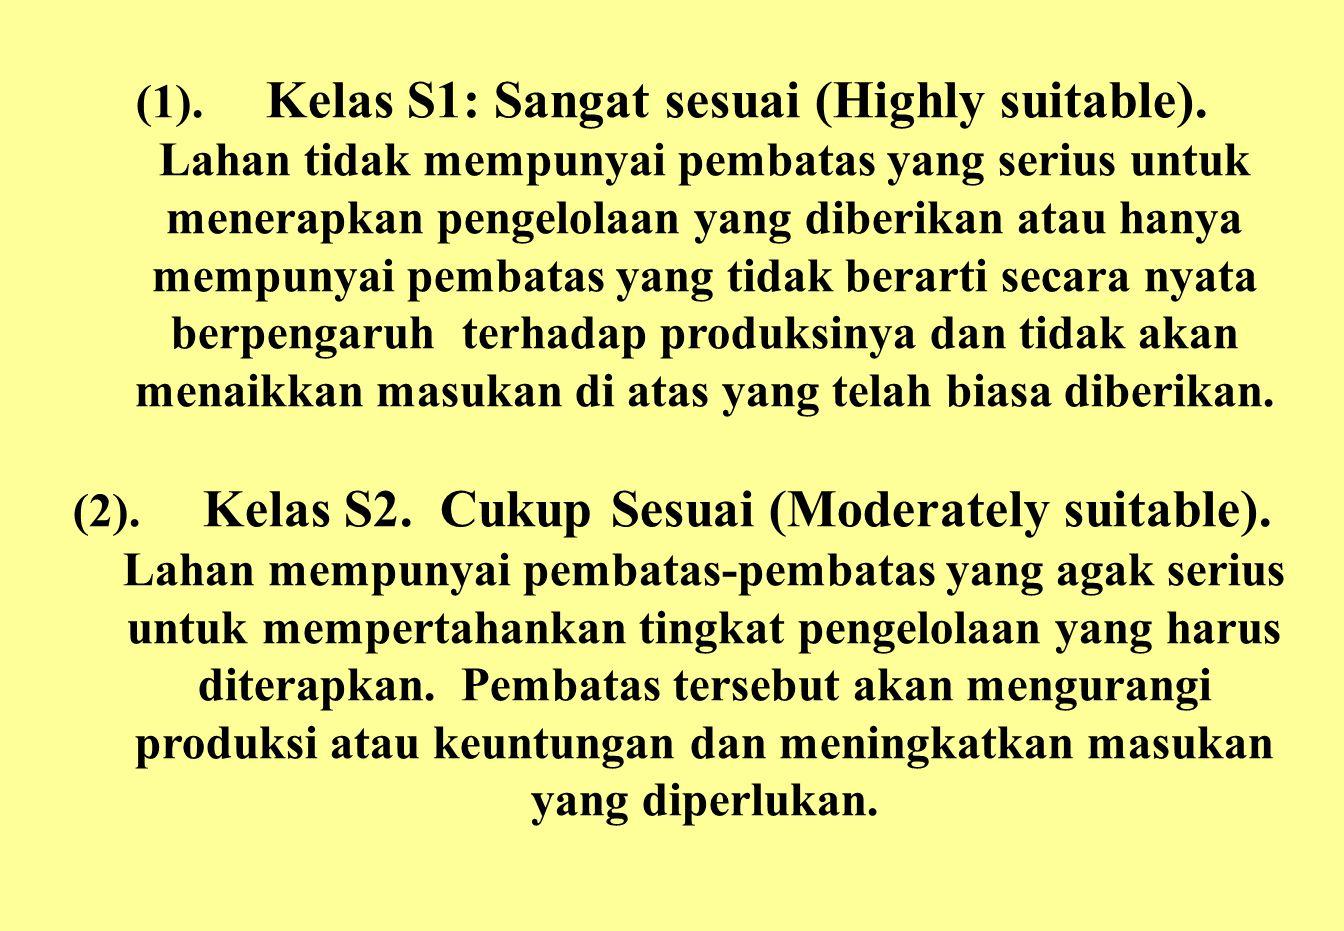 (1). Kelas S1: Sangat sesuai (Highly suitable). Lahan tidak mempunyai pembatas yang serius untuk menerapkan pengelolaan yang diberikan atau hanya memp